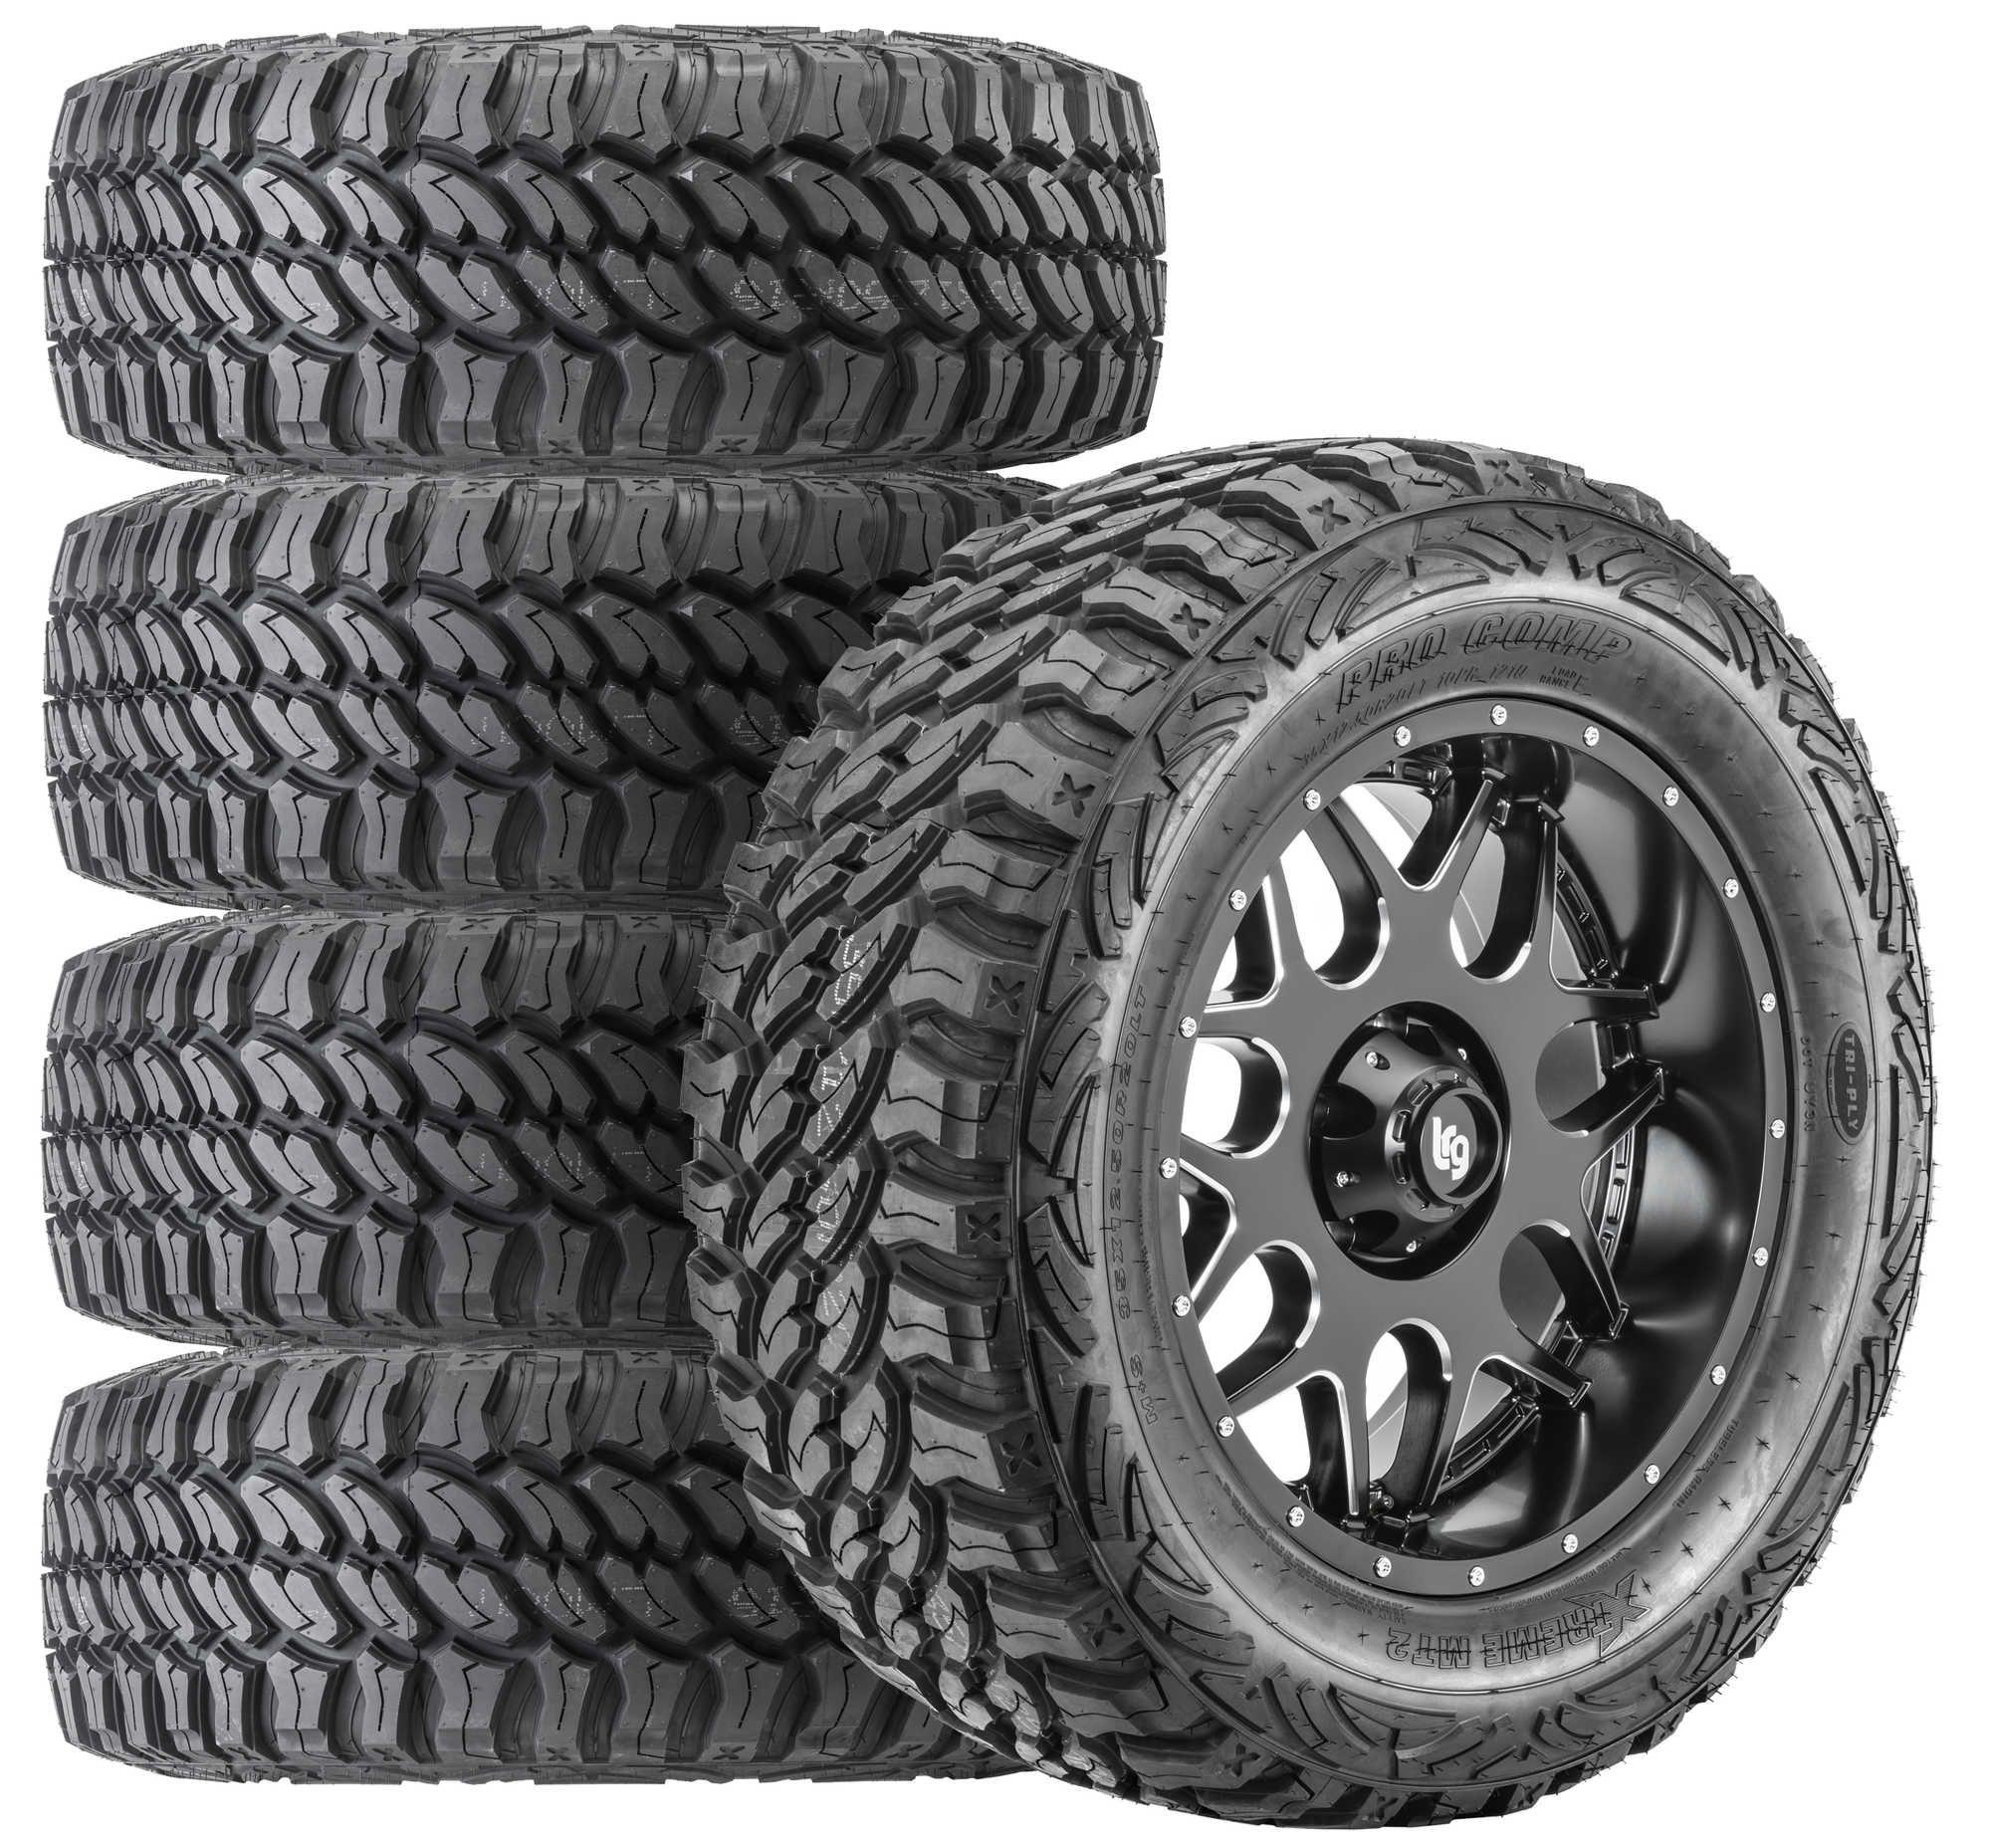 Pro Comp Lighting Xtreme M/T2 Radial Tire on LRG Splits